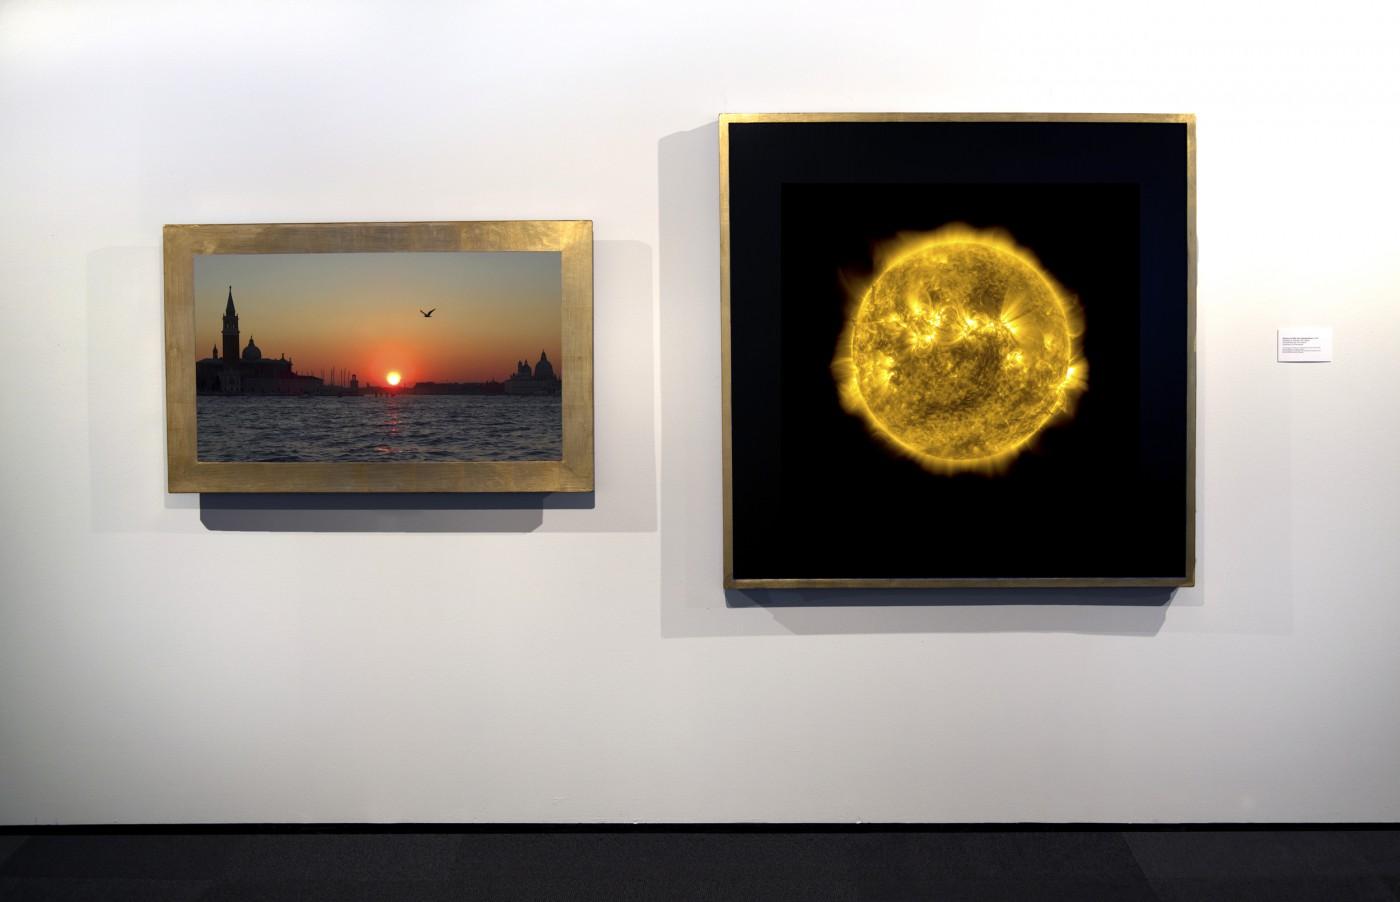 Dan Hudson, </span><span><em>Illusion of the Sun Going Down (2 channel video)</em>, </span><span>2015